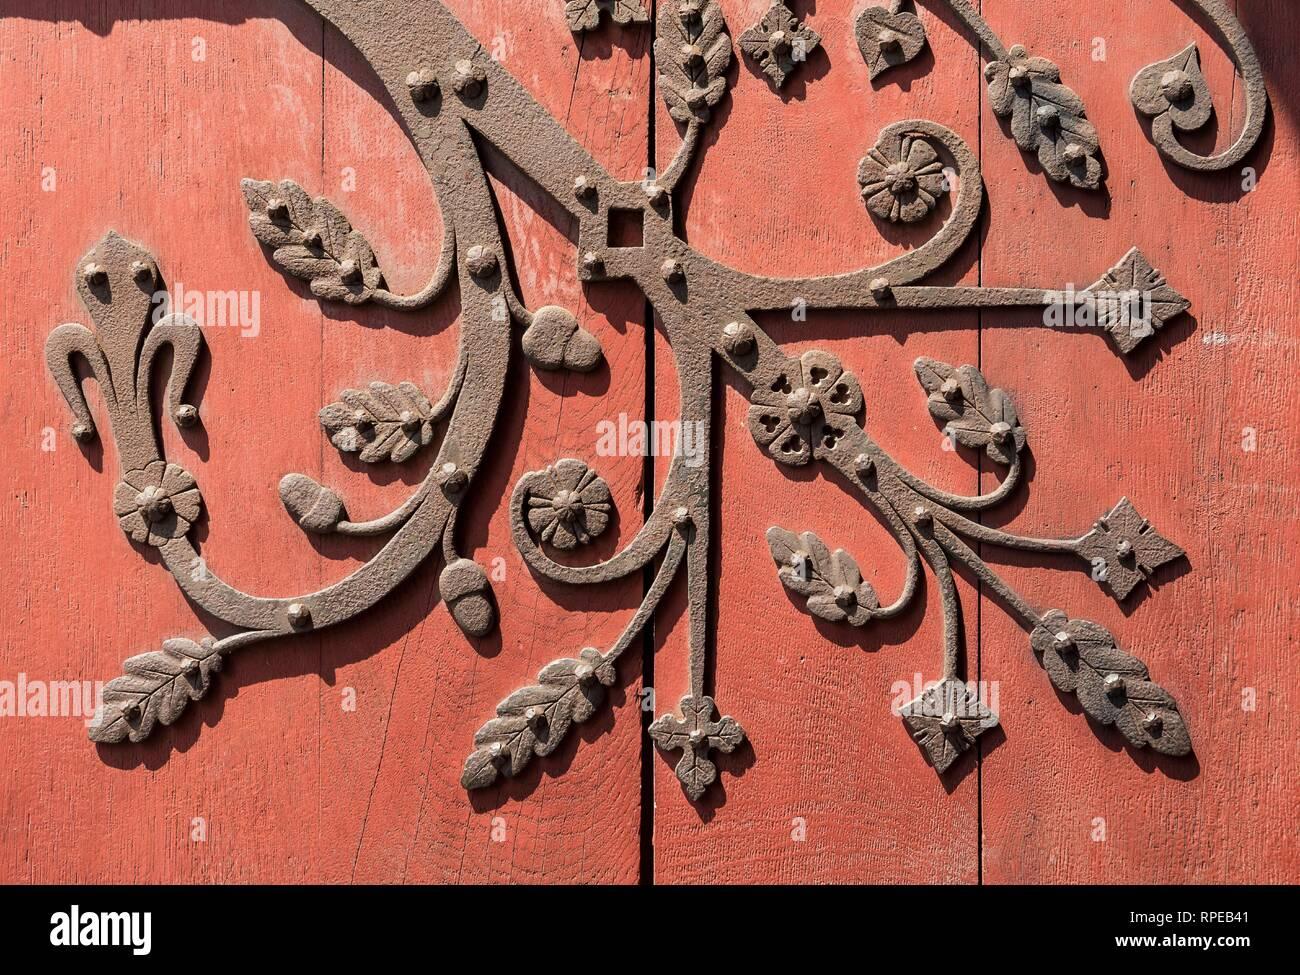 Ornate metal fittings on wooden door, Strasbourg, France Stock Photo